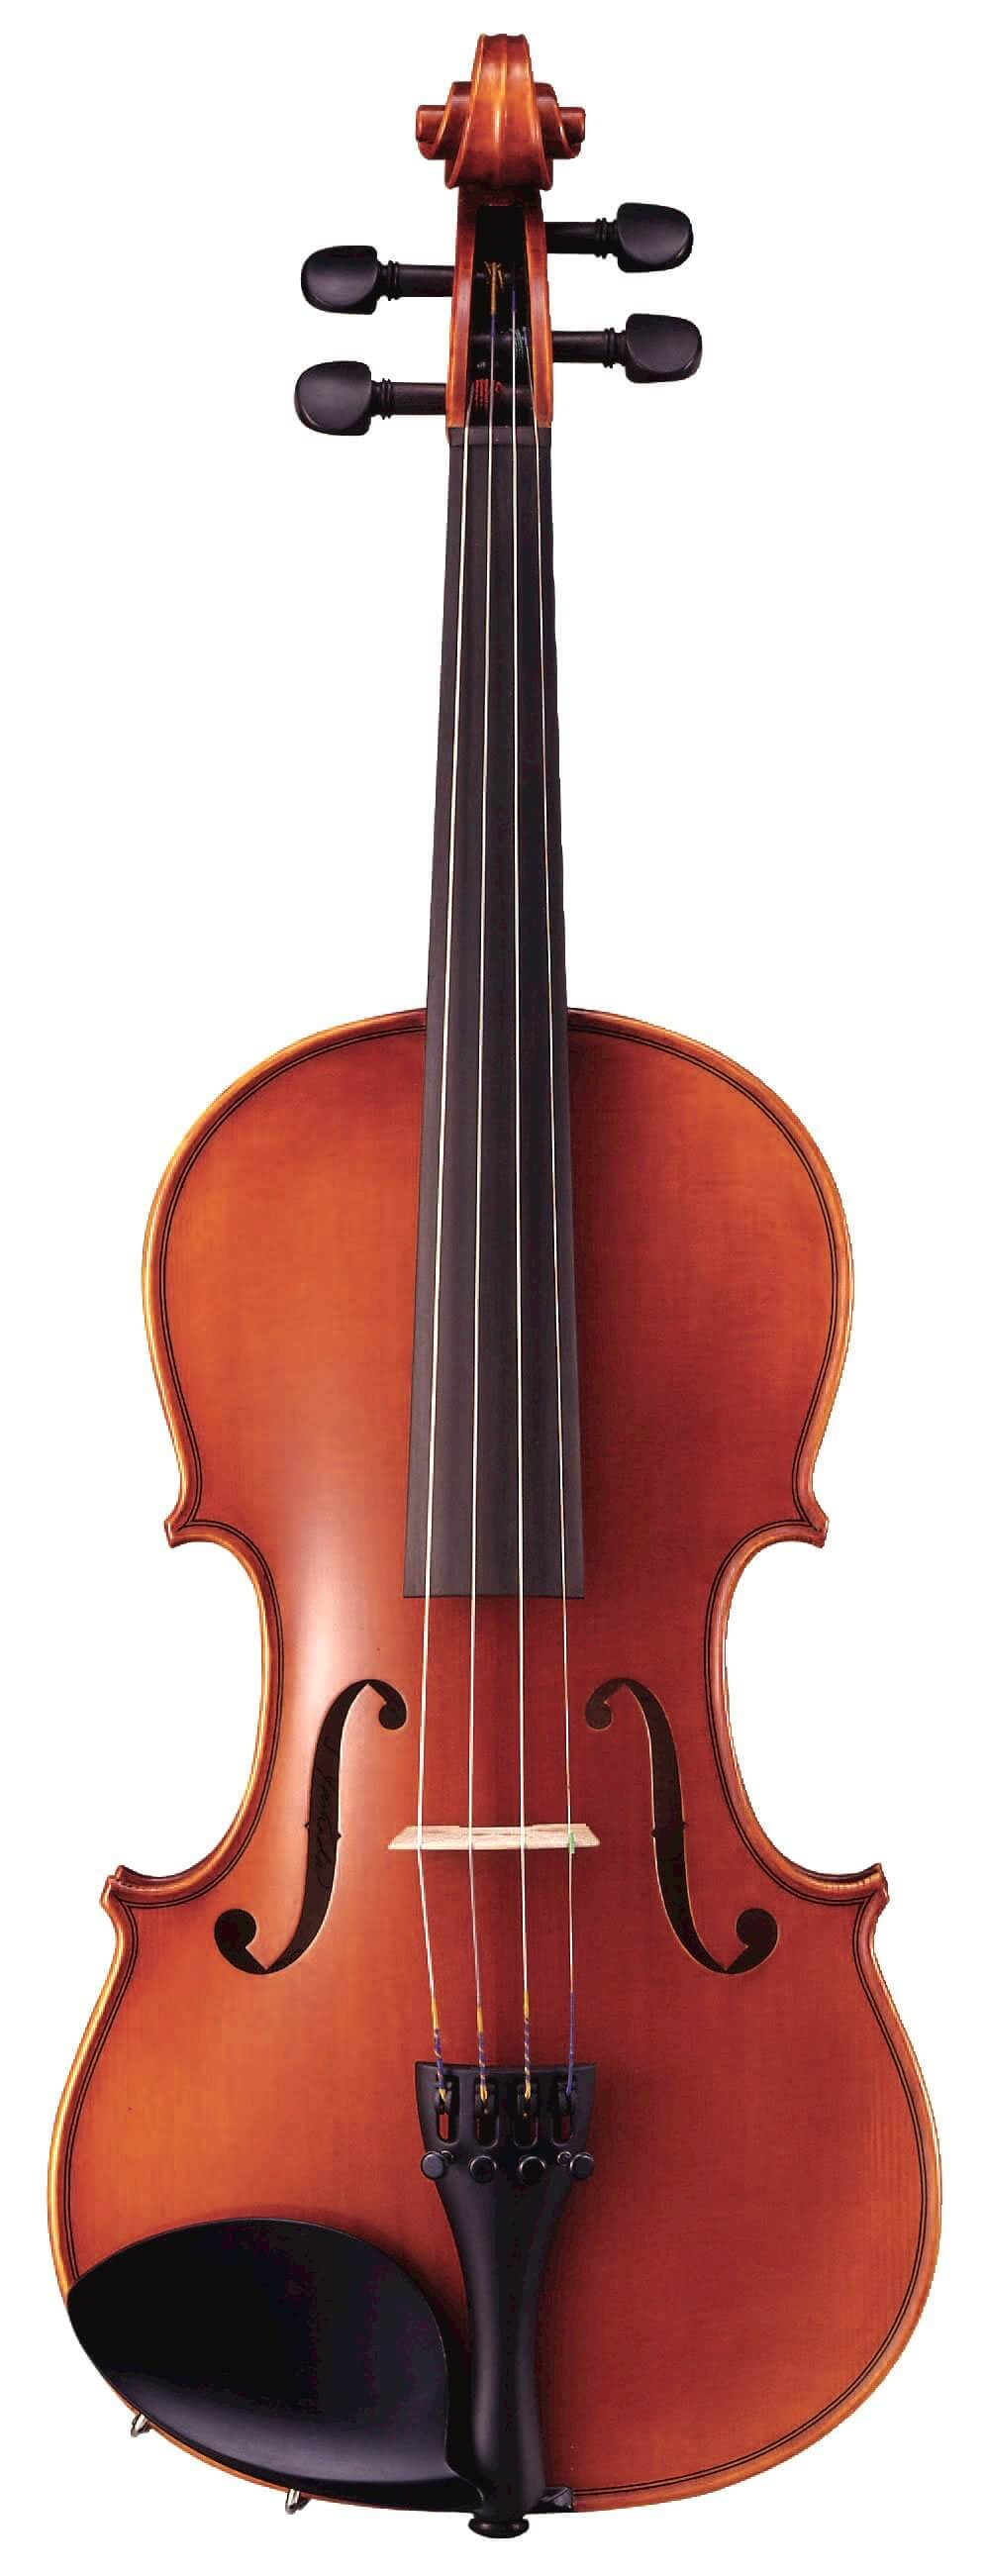 Violín Yamaha V7G 4/4. Violín sólo